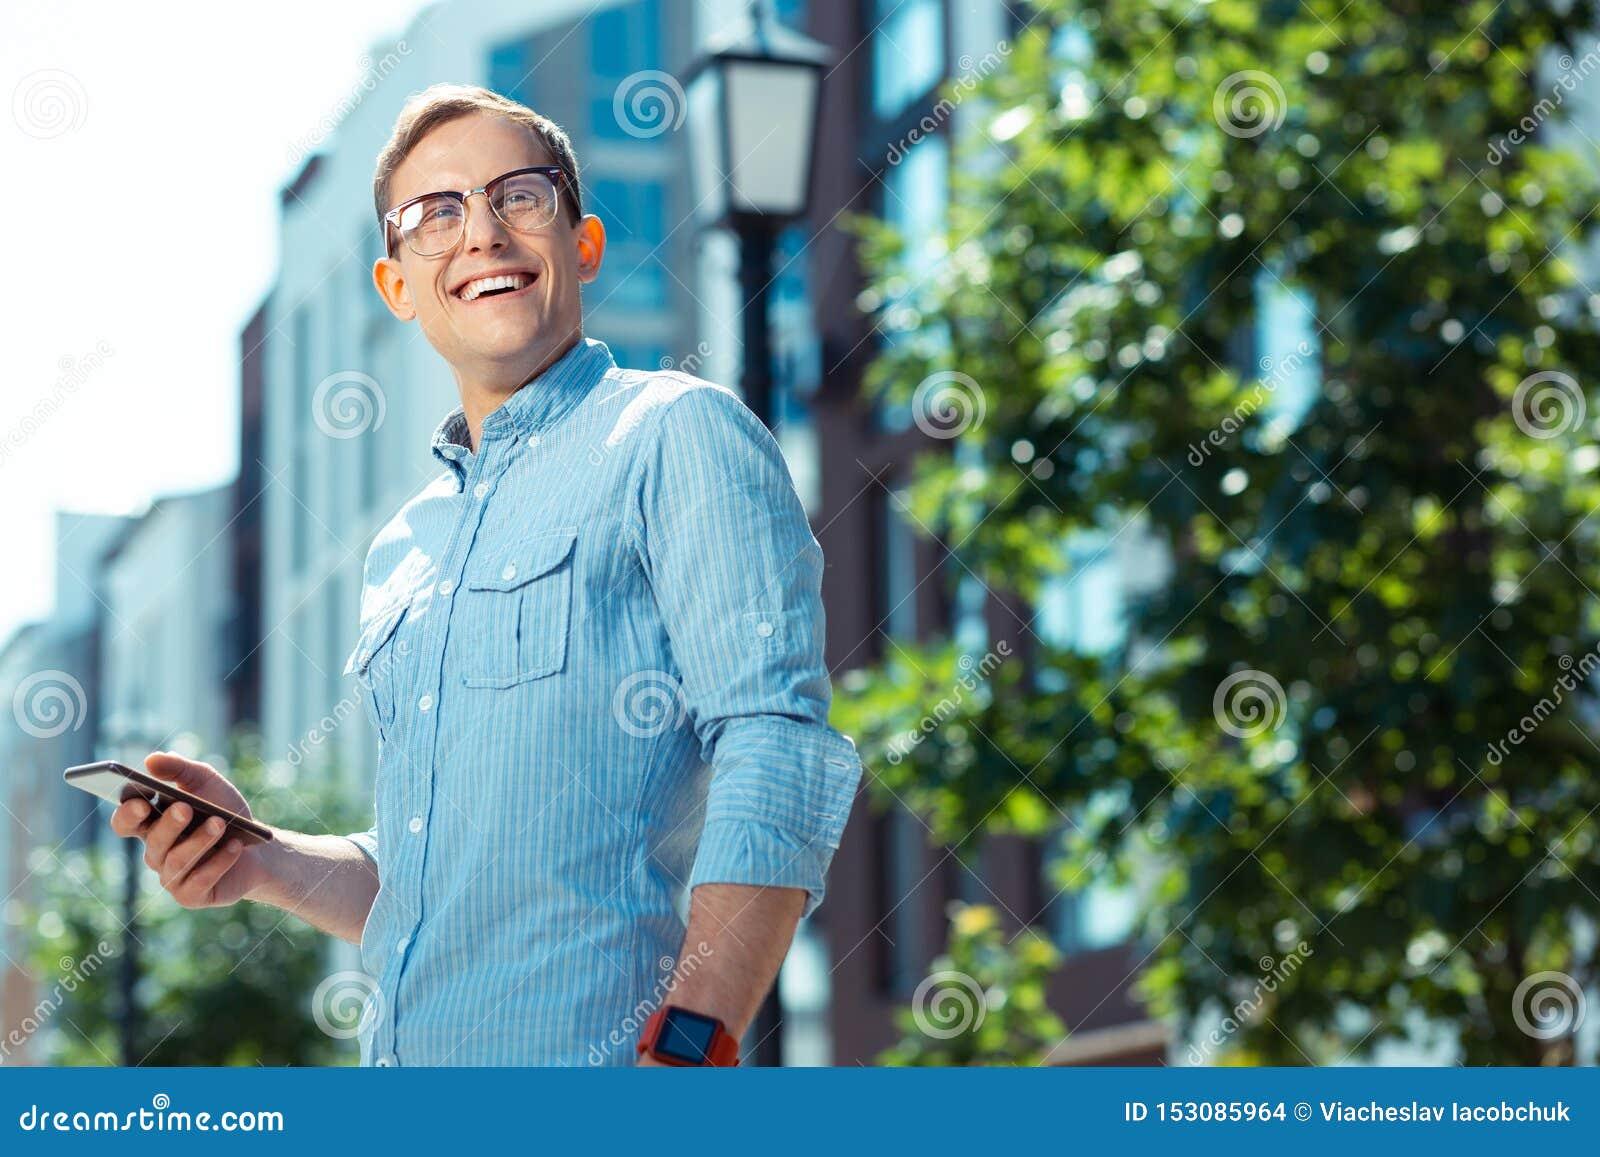 Handsome businessman smiling broadly while enjoying weekend walk